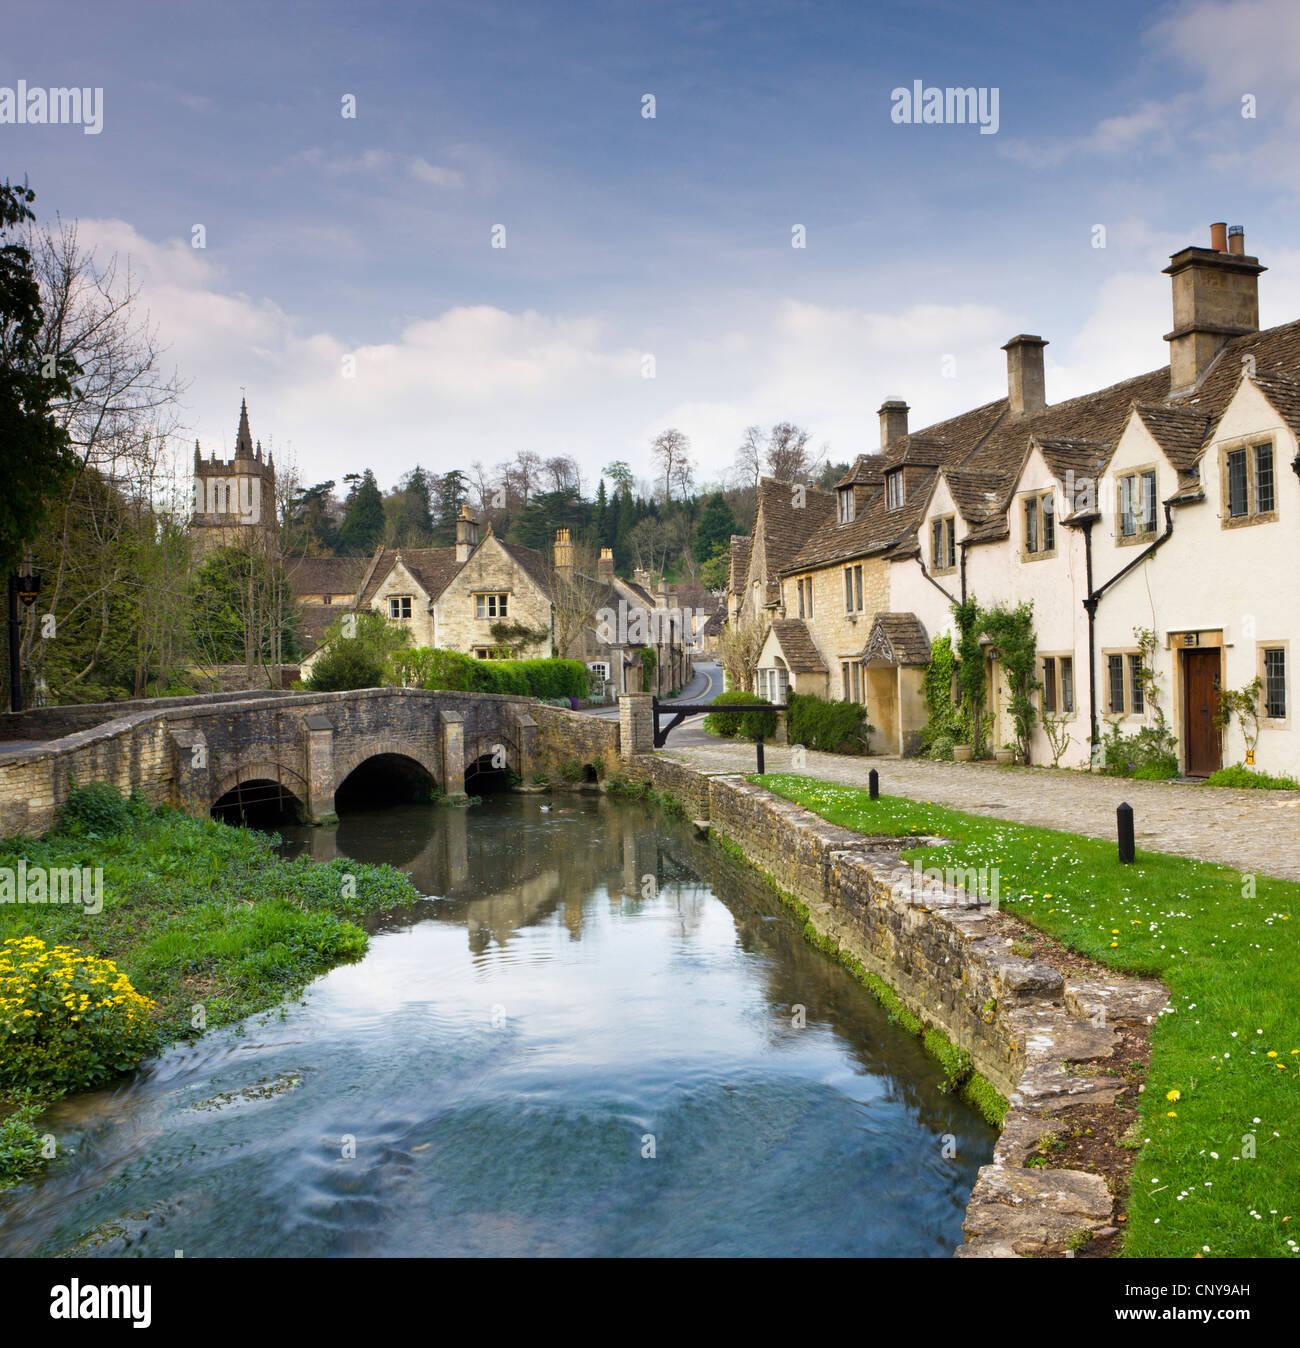 Village pittoresque Cotswolds de Castle Combe, Wiltshire, Angleterre. Printemps (avril 2009) Photo Stock